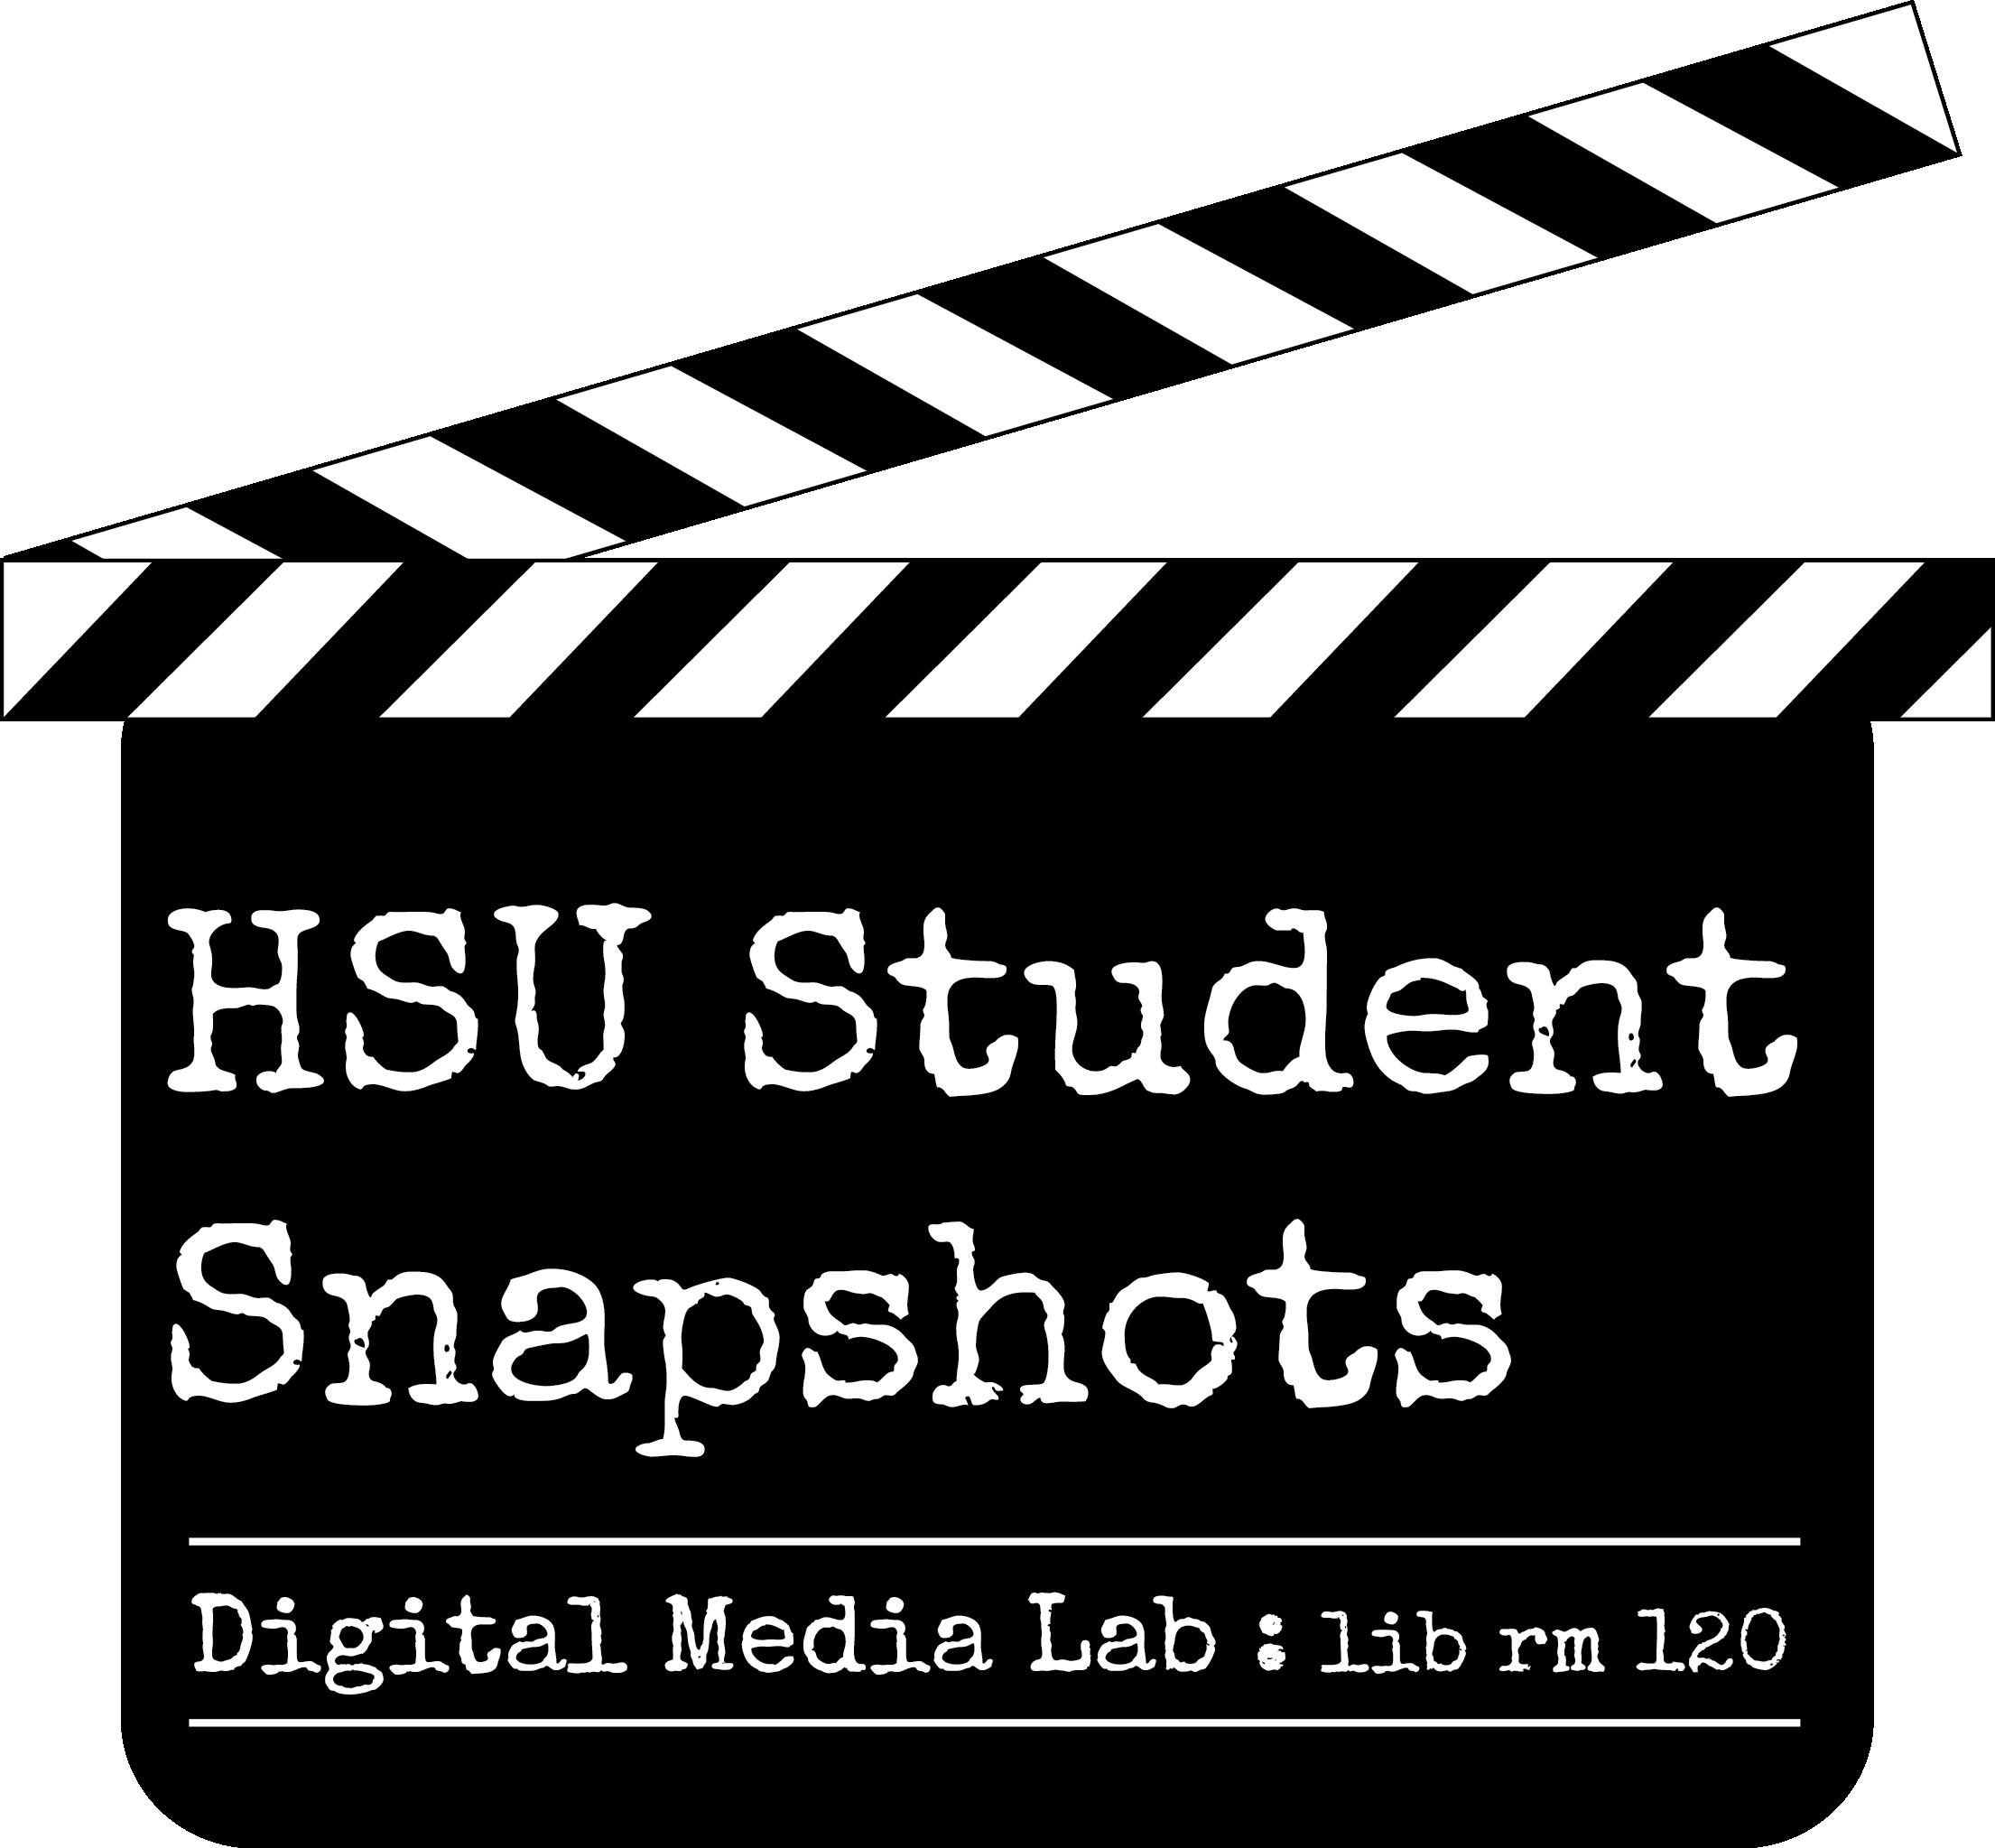 HSU Student Snapshots